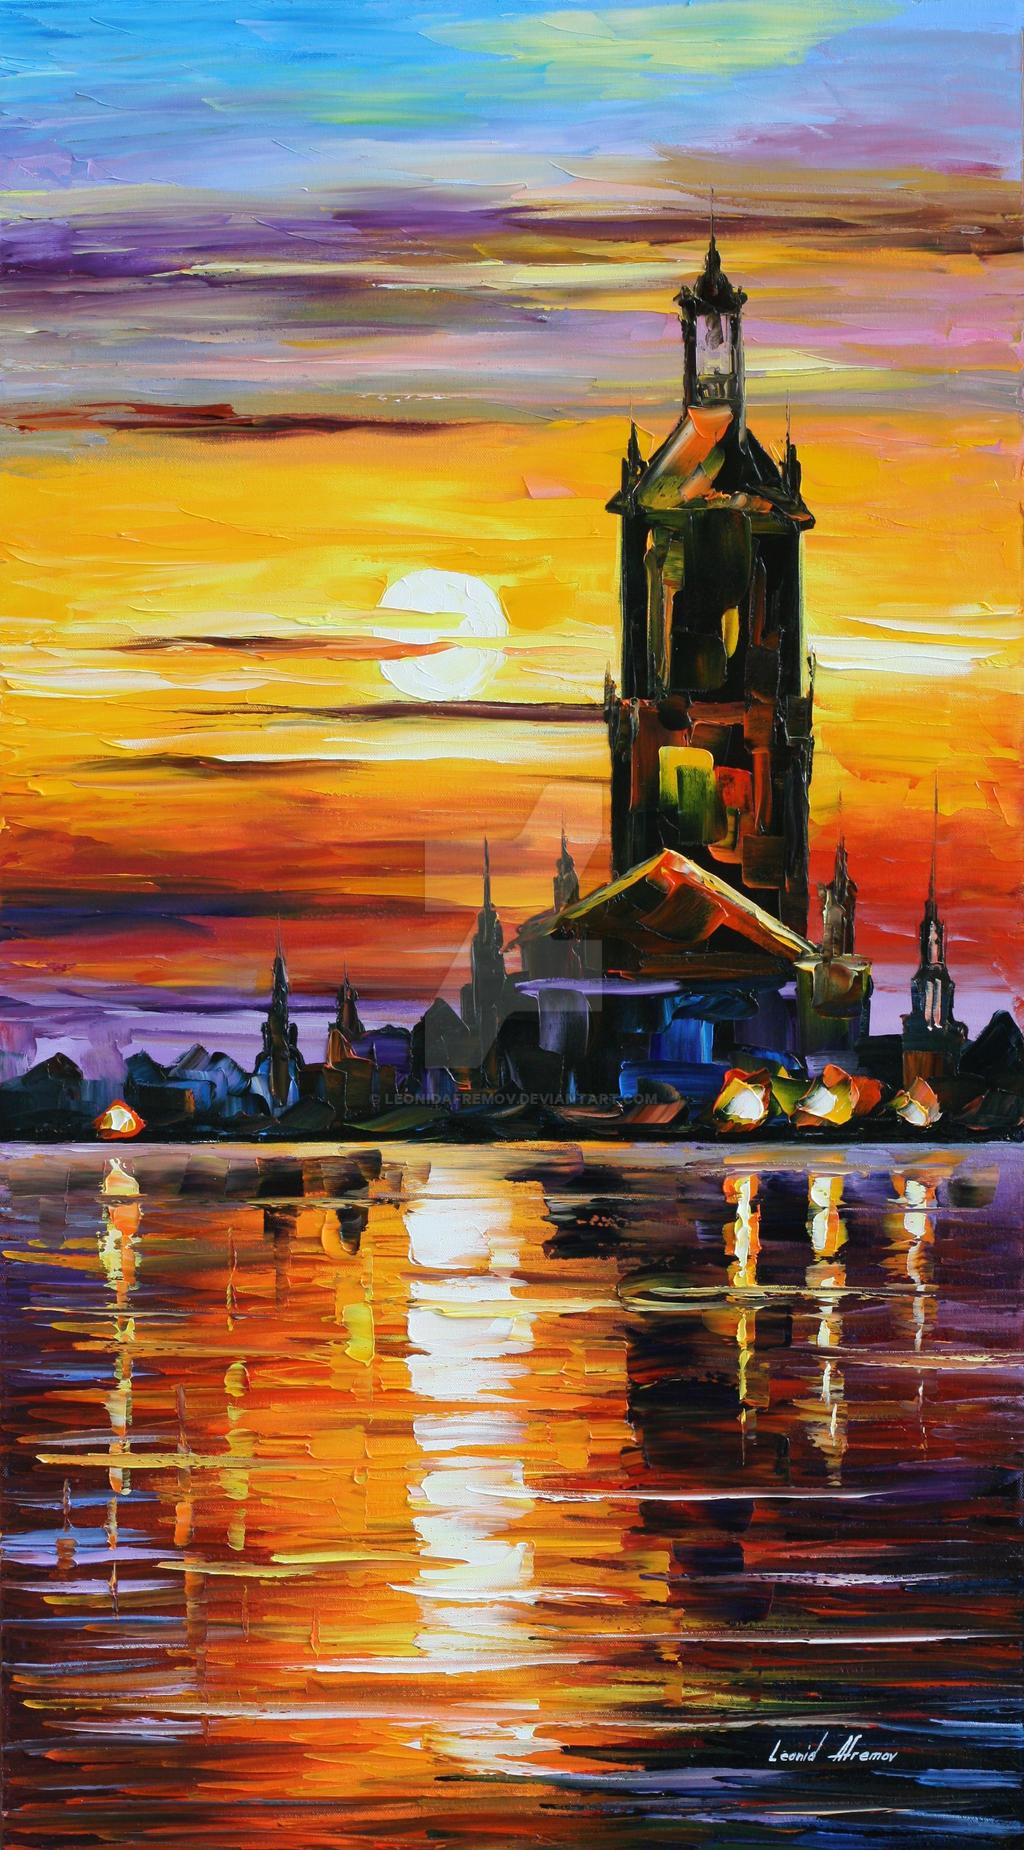 Old tower by Leonid Afremov by Leonidafremov